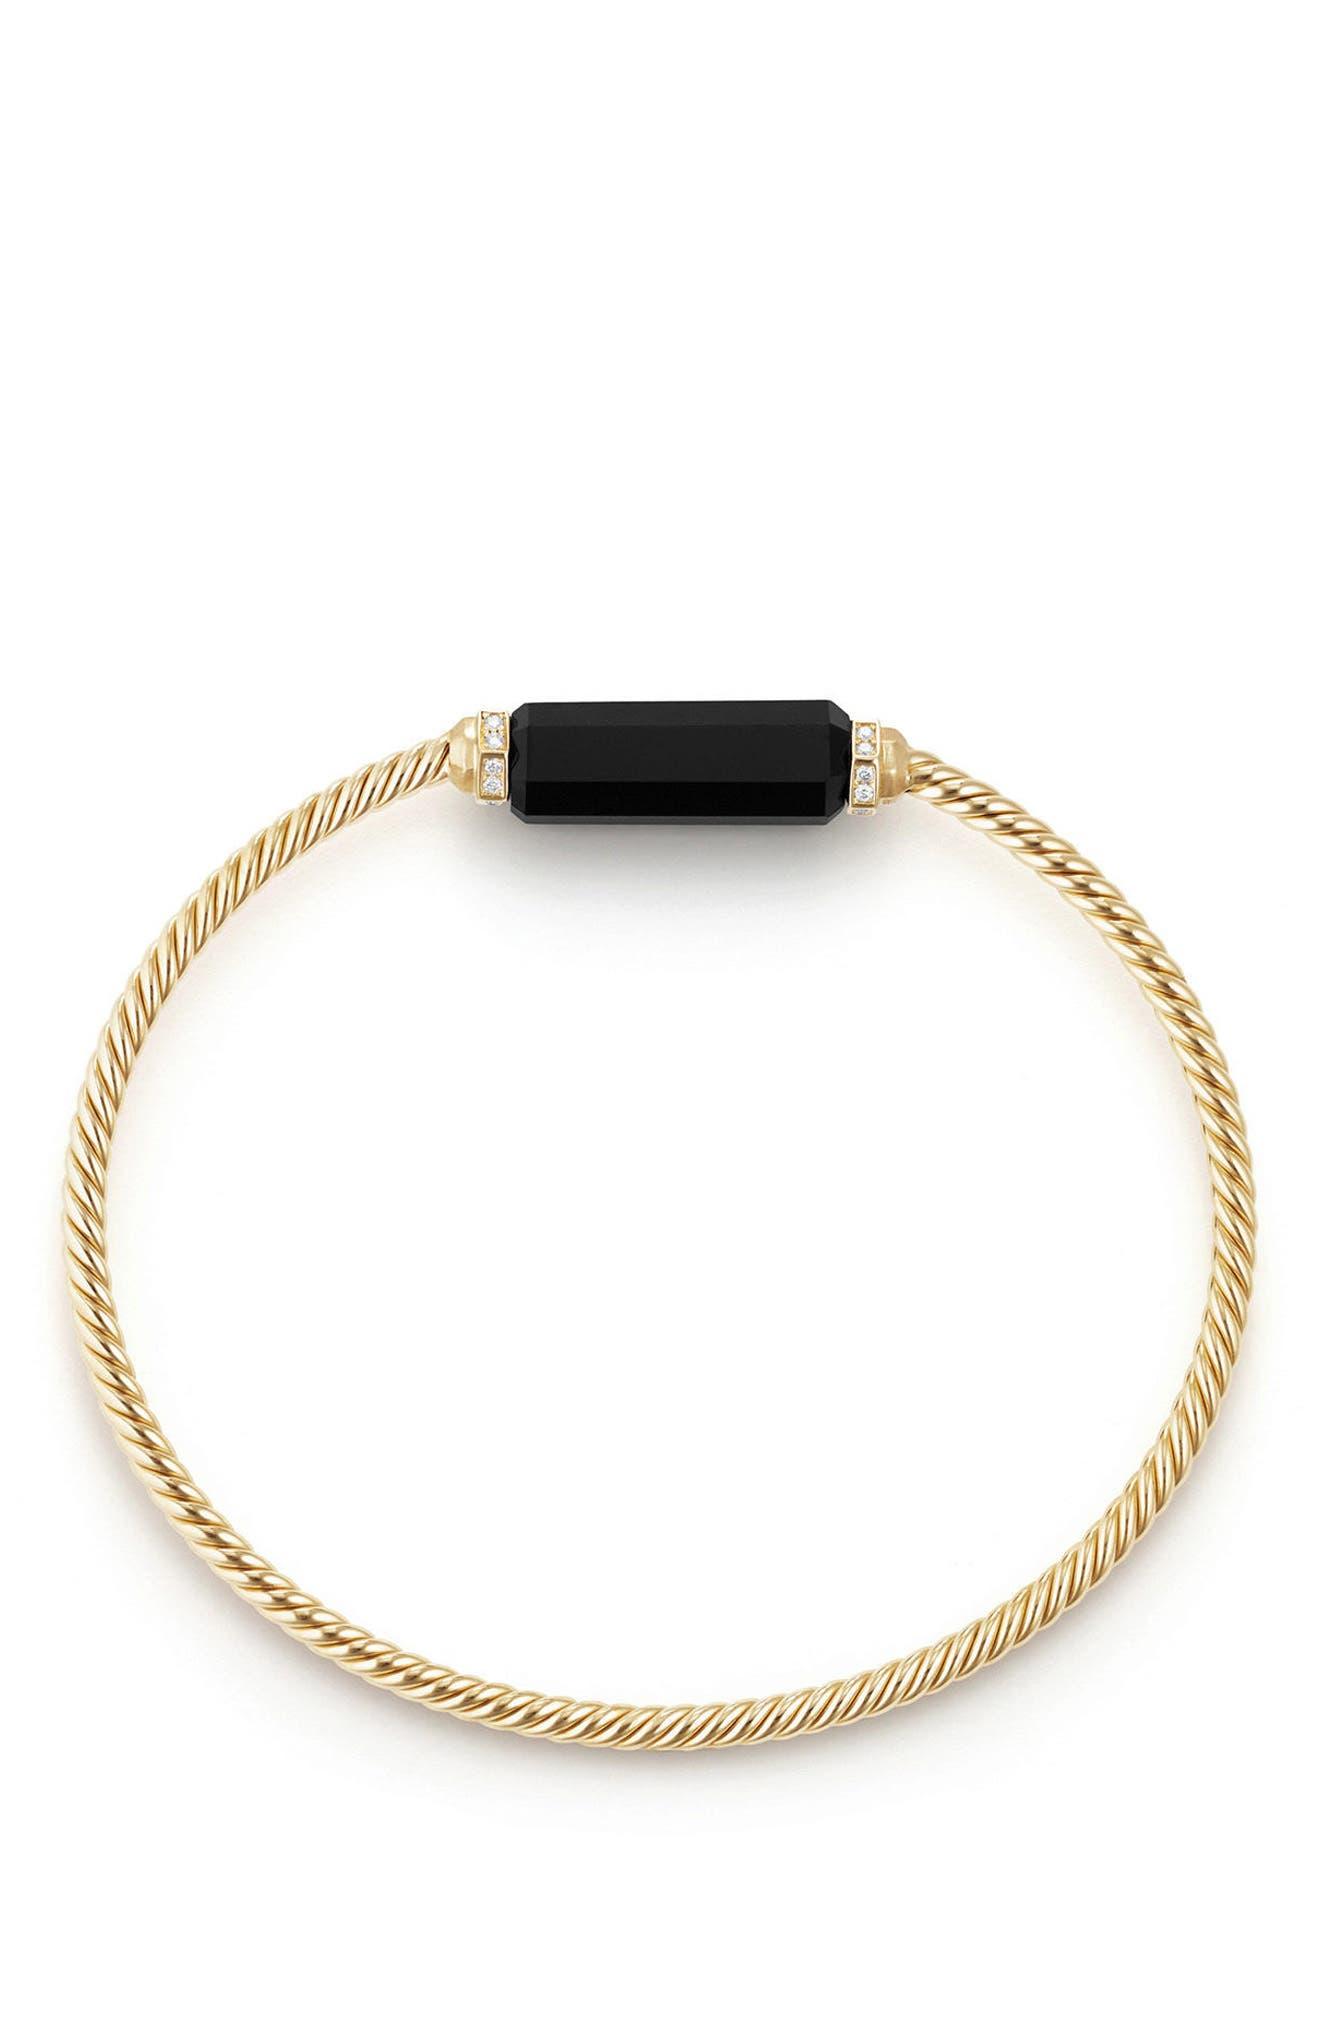 Barrels Bracelet with Diamonds in 18K Gold,                             Alternate thumbnail 2, color,                             BLACK ONYX